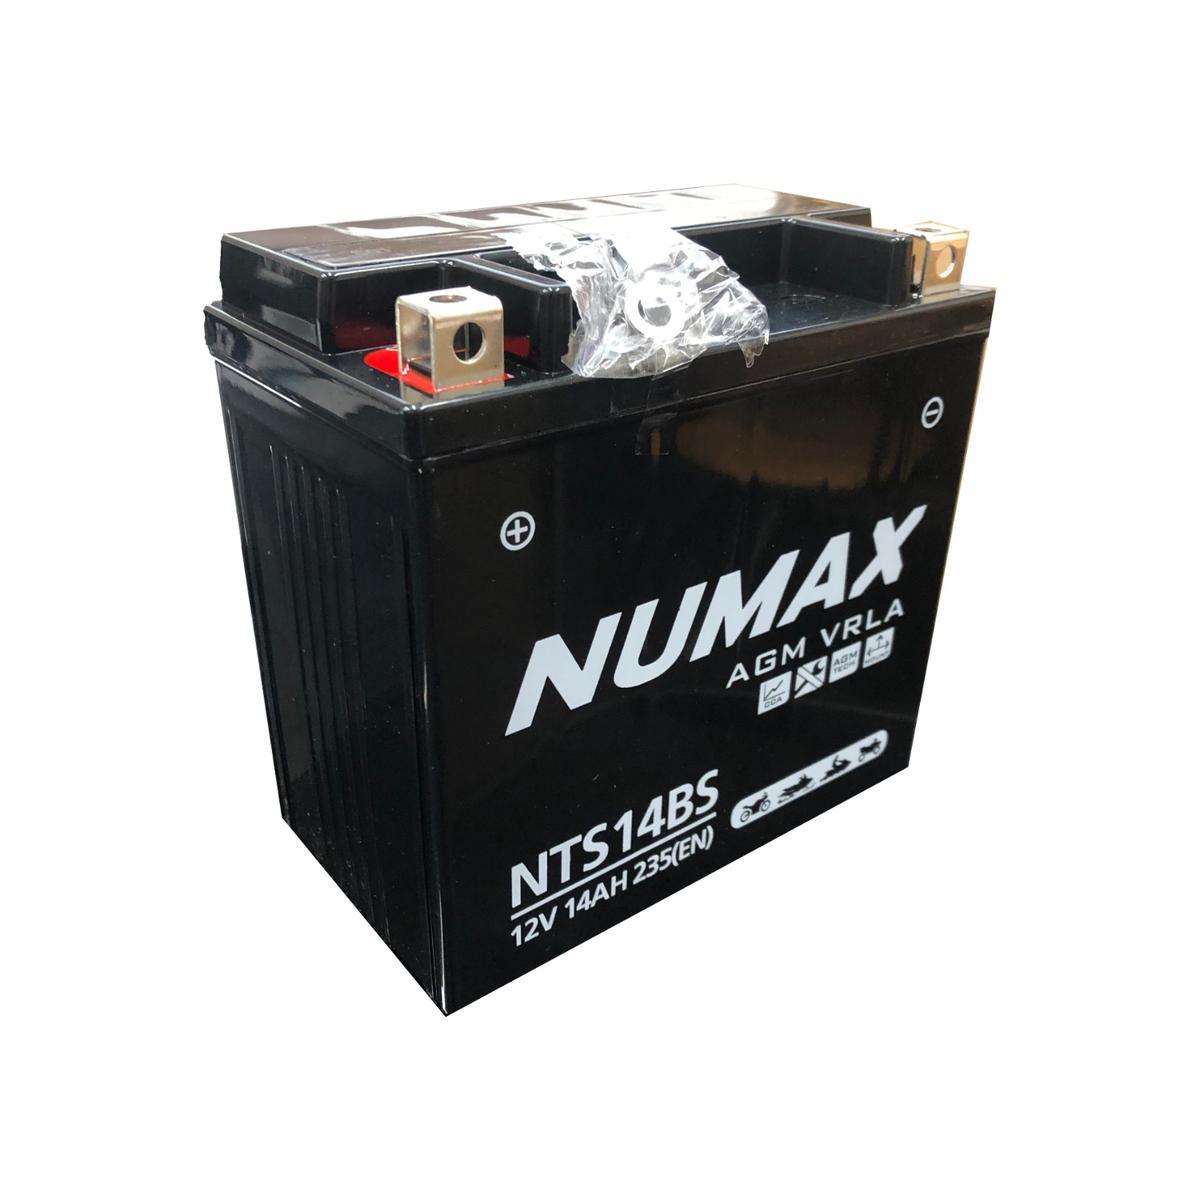 Numax NTS14BS 12v Motorbike Bike Battery KAWASAKI 1100cc ZZR1100EU YTX14-4